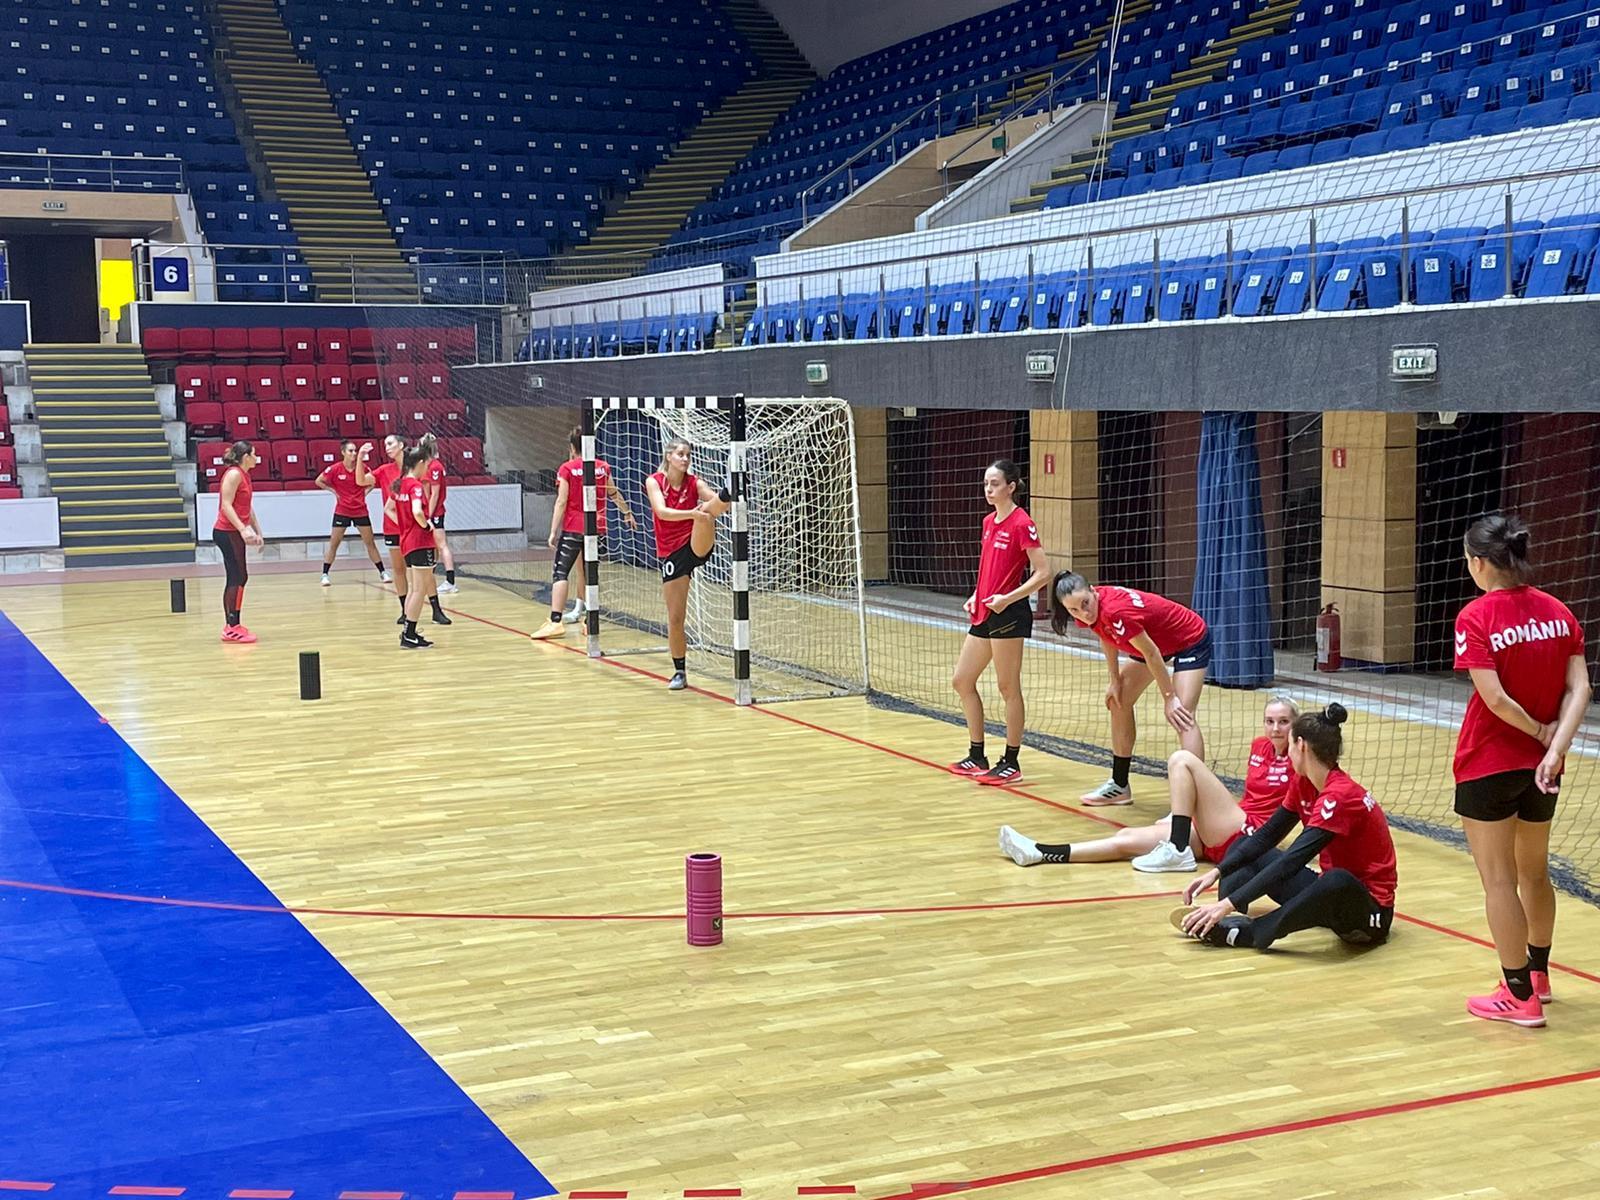 Antrenament al lotului național de handbal feminin